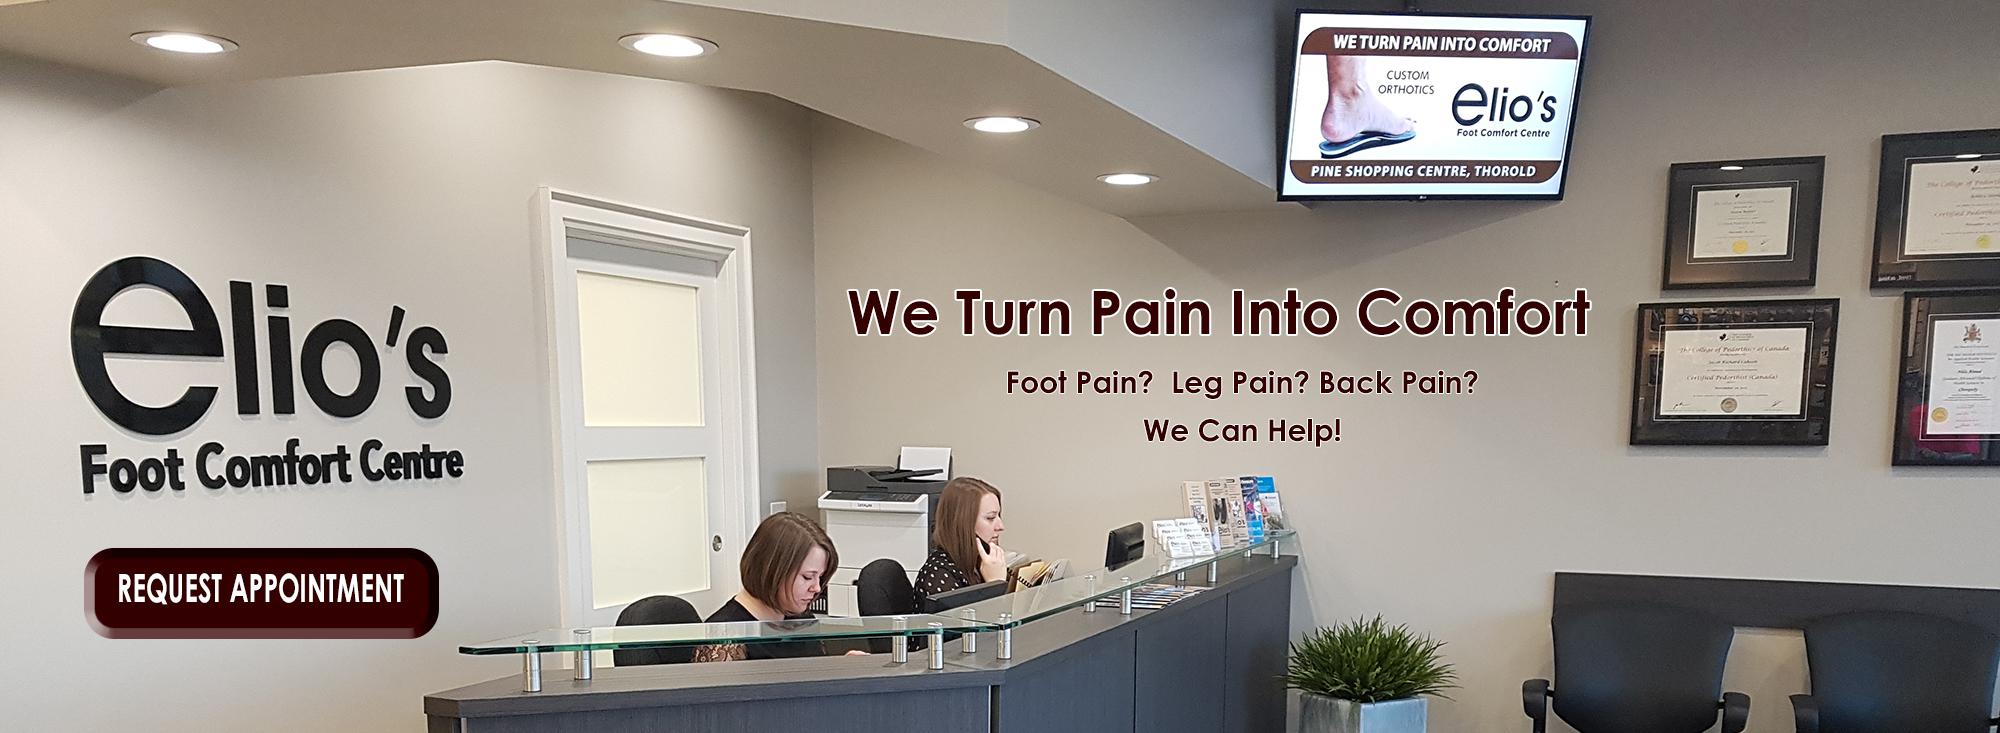 orthotics | compression | bracing | custom shoes | orthopedic footwear | Elio's Foot Comfort Centre